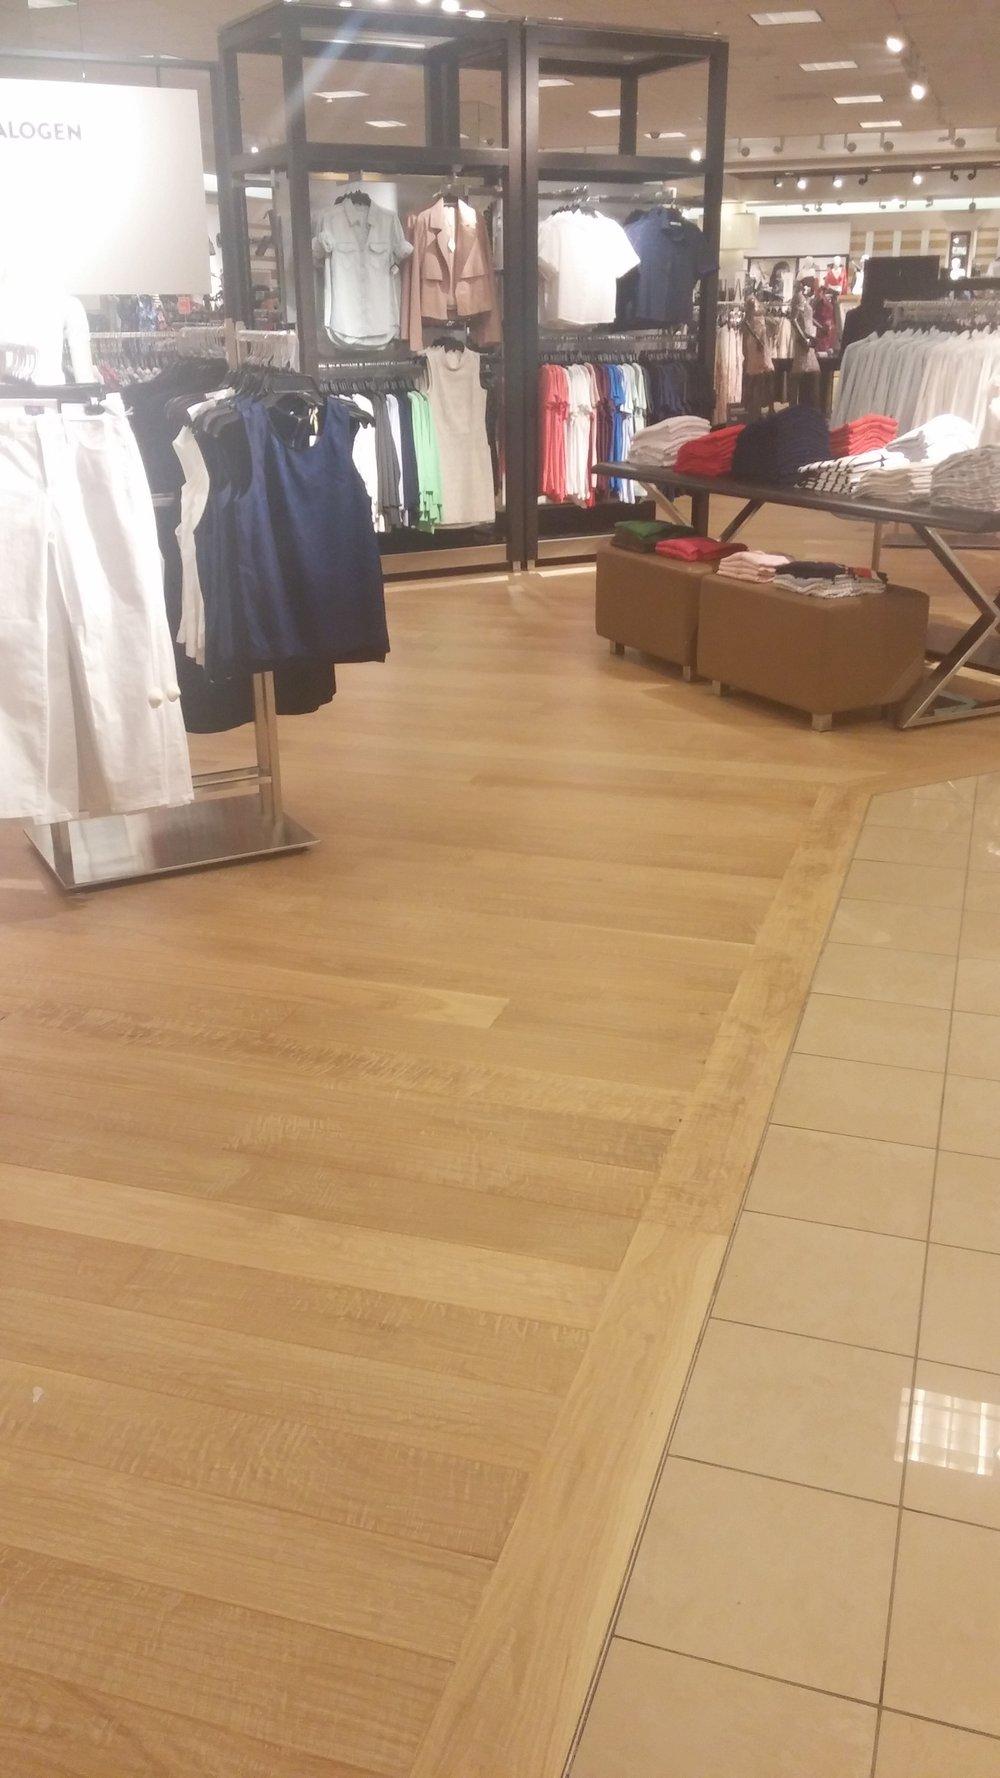 Major Retail-0015.jpg